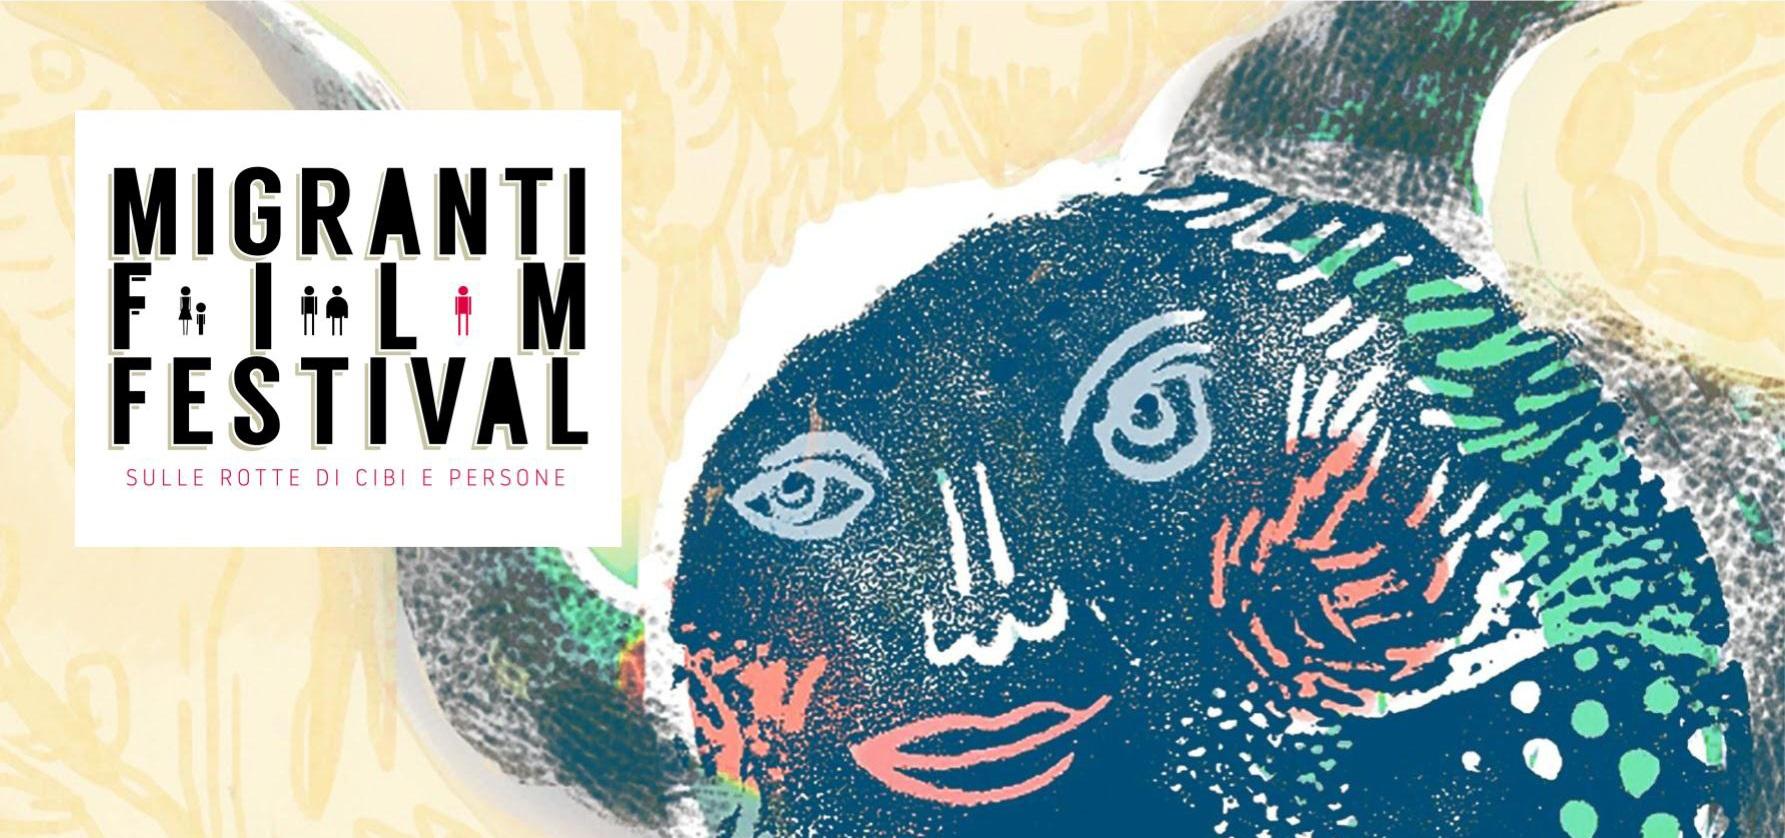 locandina-migranti-film-festival-2019.jpg